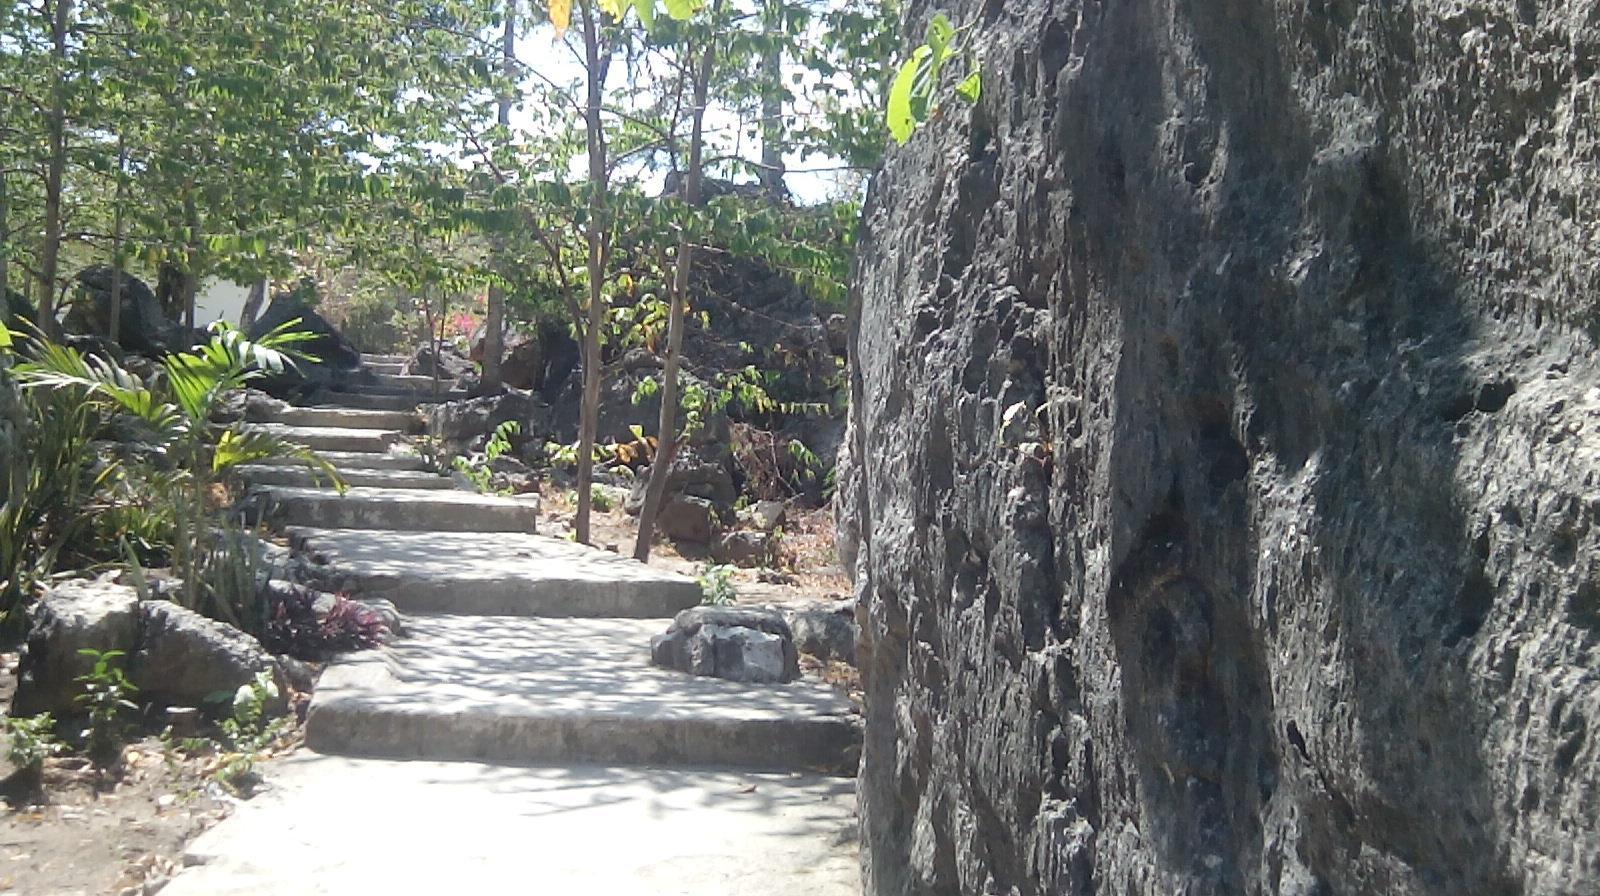 Taman Wisata Liang Bukal